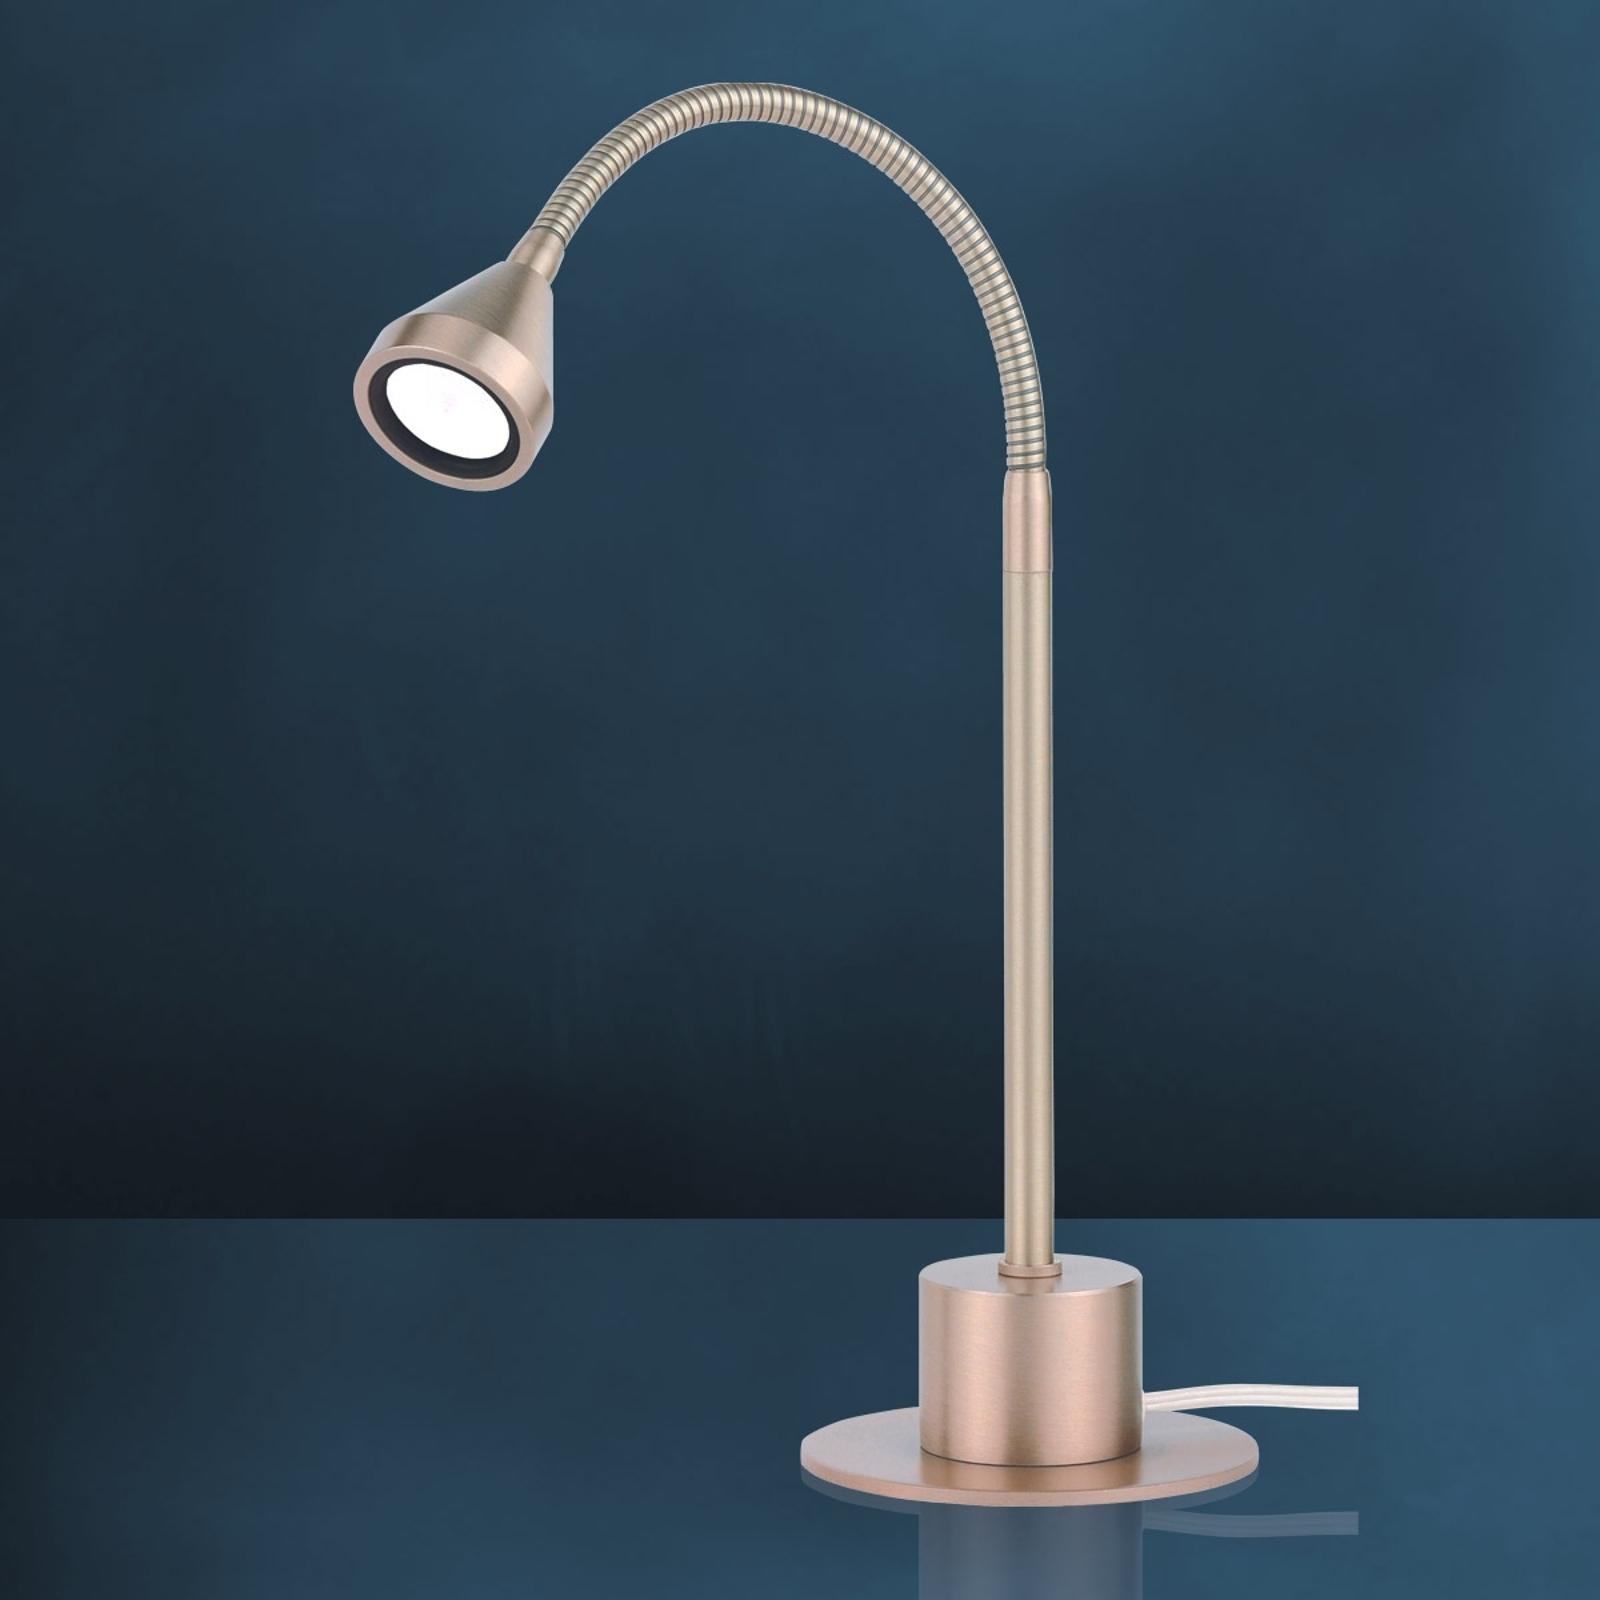 Stolní lampa LED MINI, flex. rameno, bílá